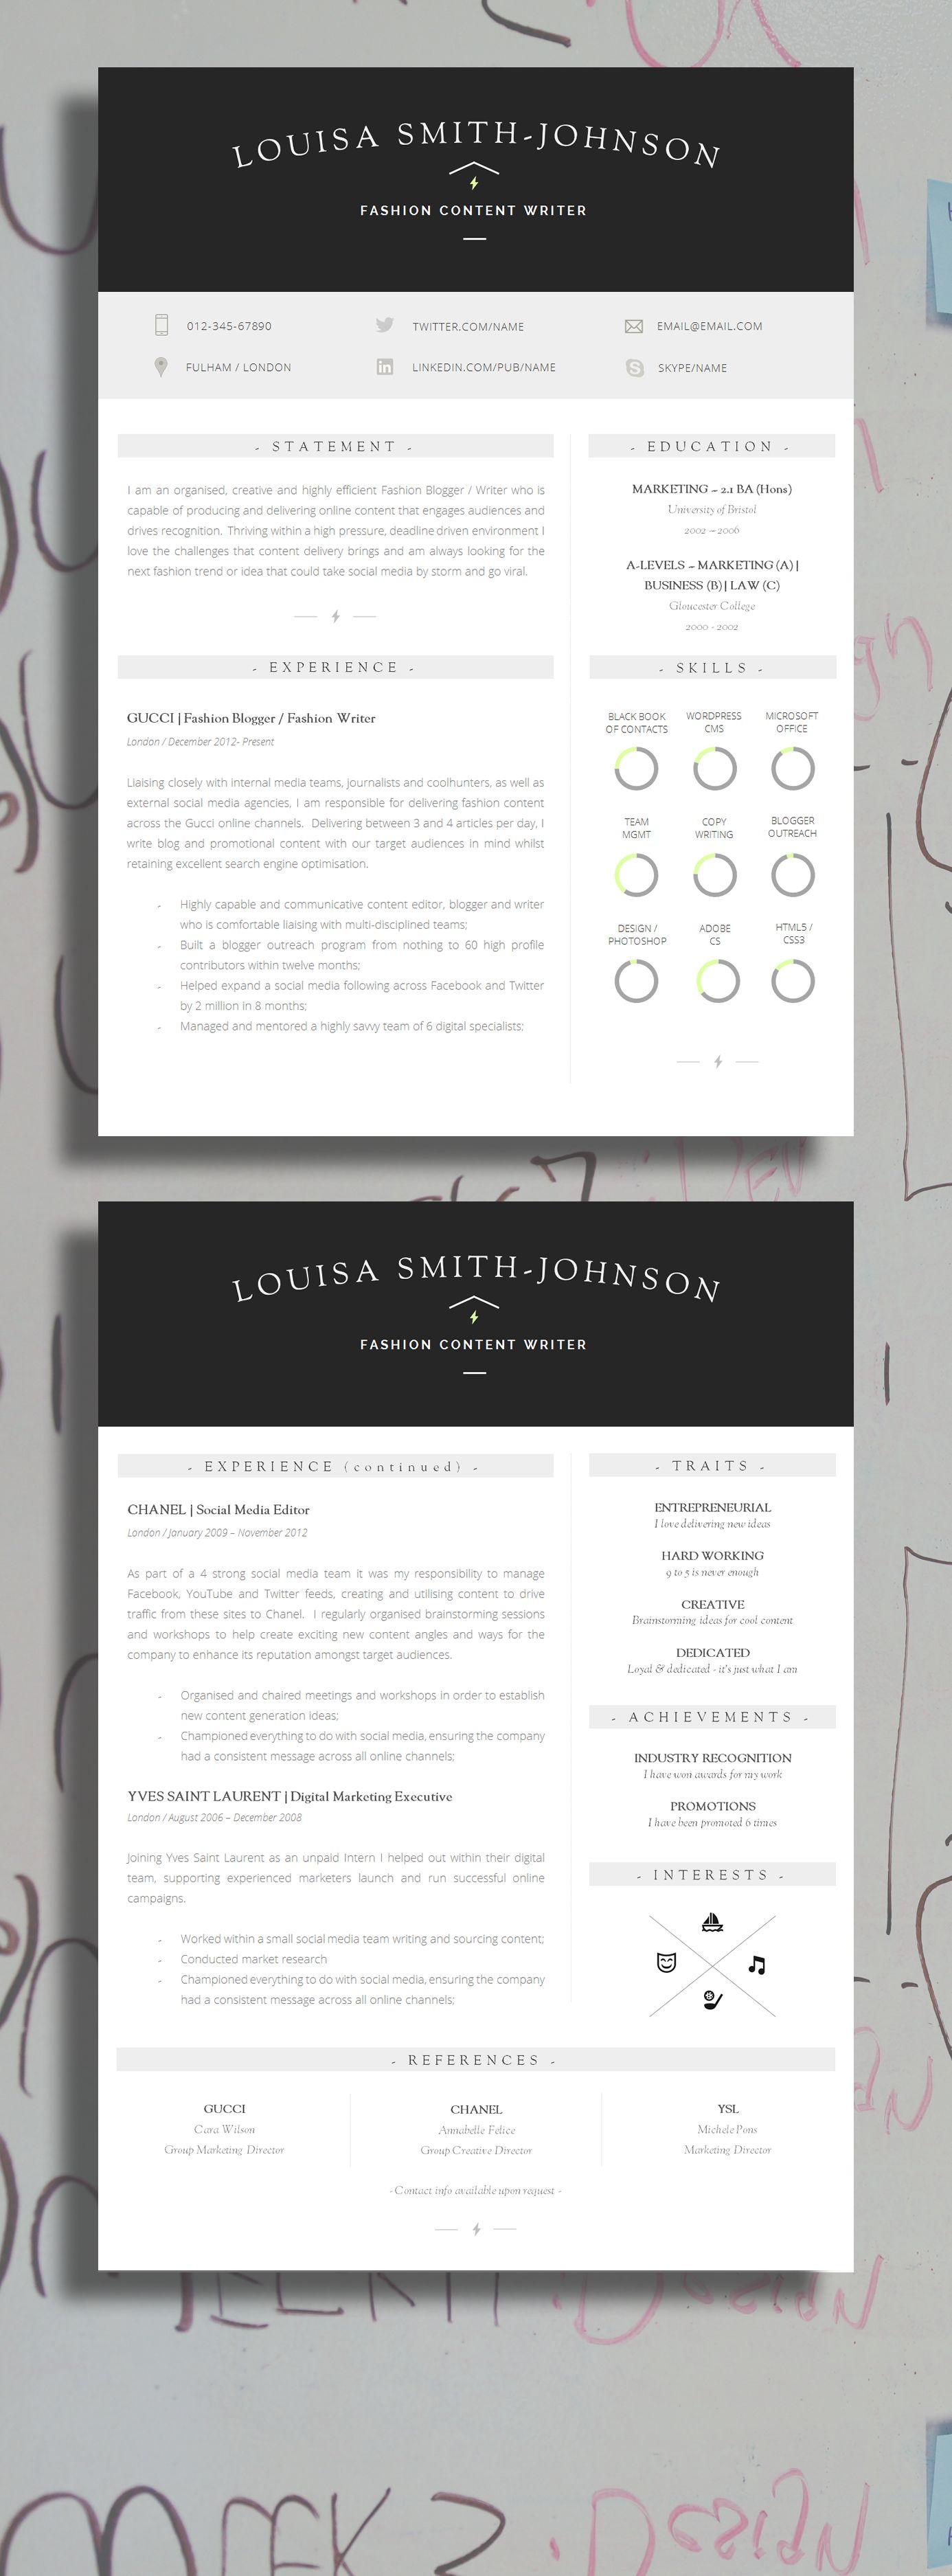 Resume Template + Cover Letter + Resume